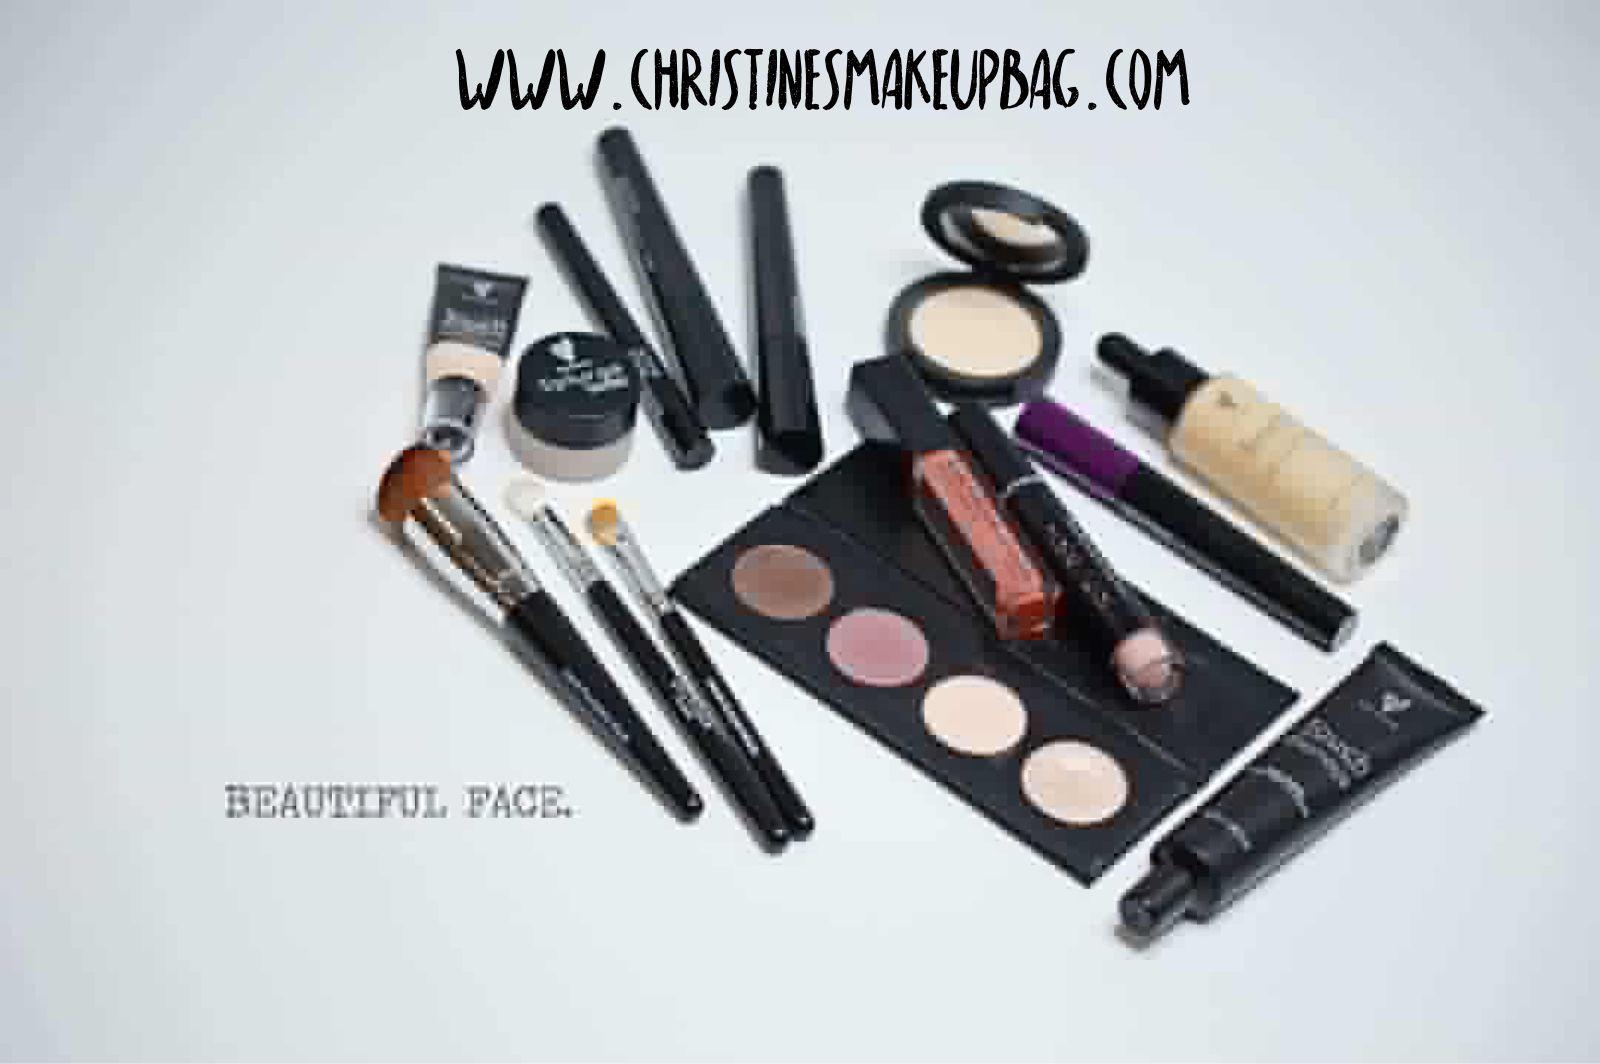 Hurry! Younique, Beautiful face, Makeup bag